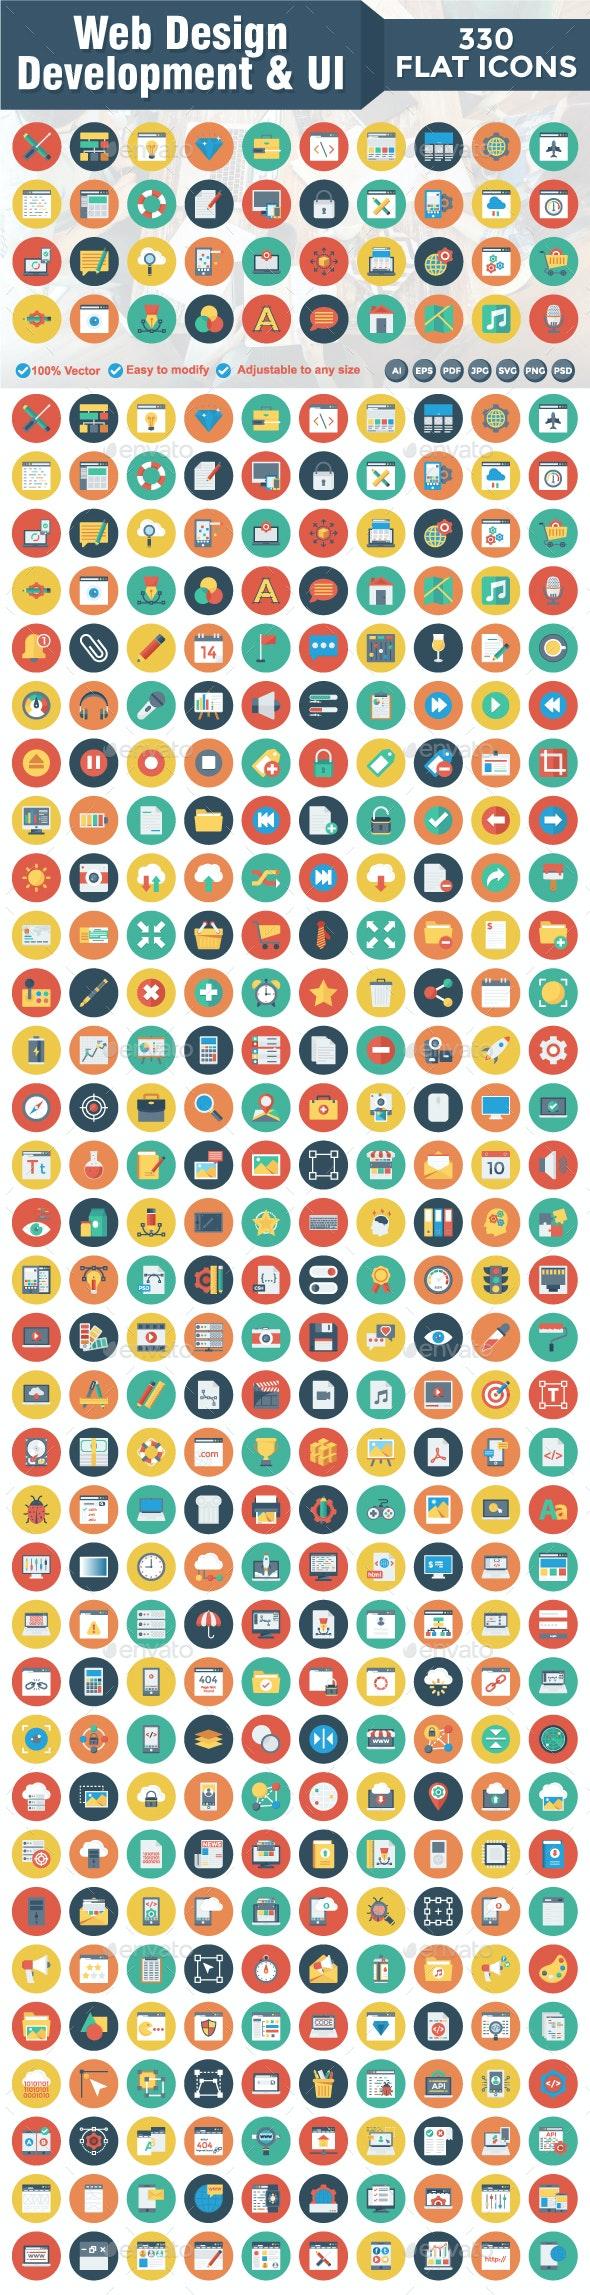 Web Design Development & UI - Web Icons